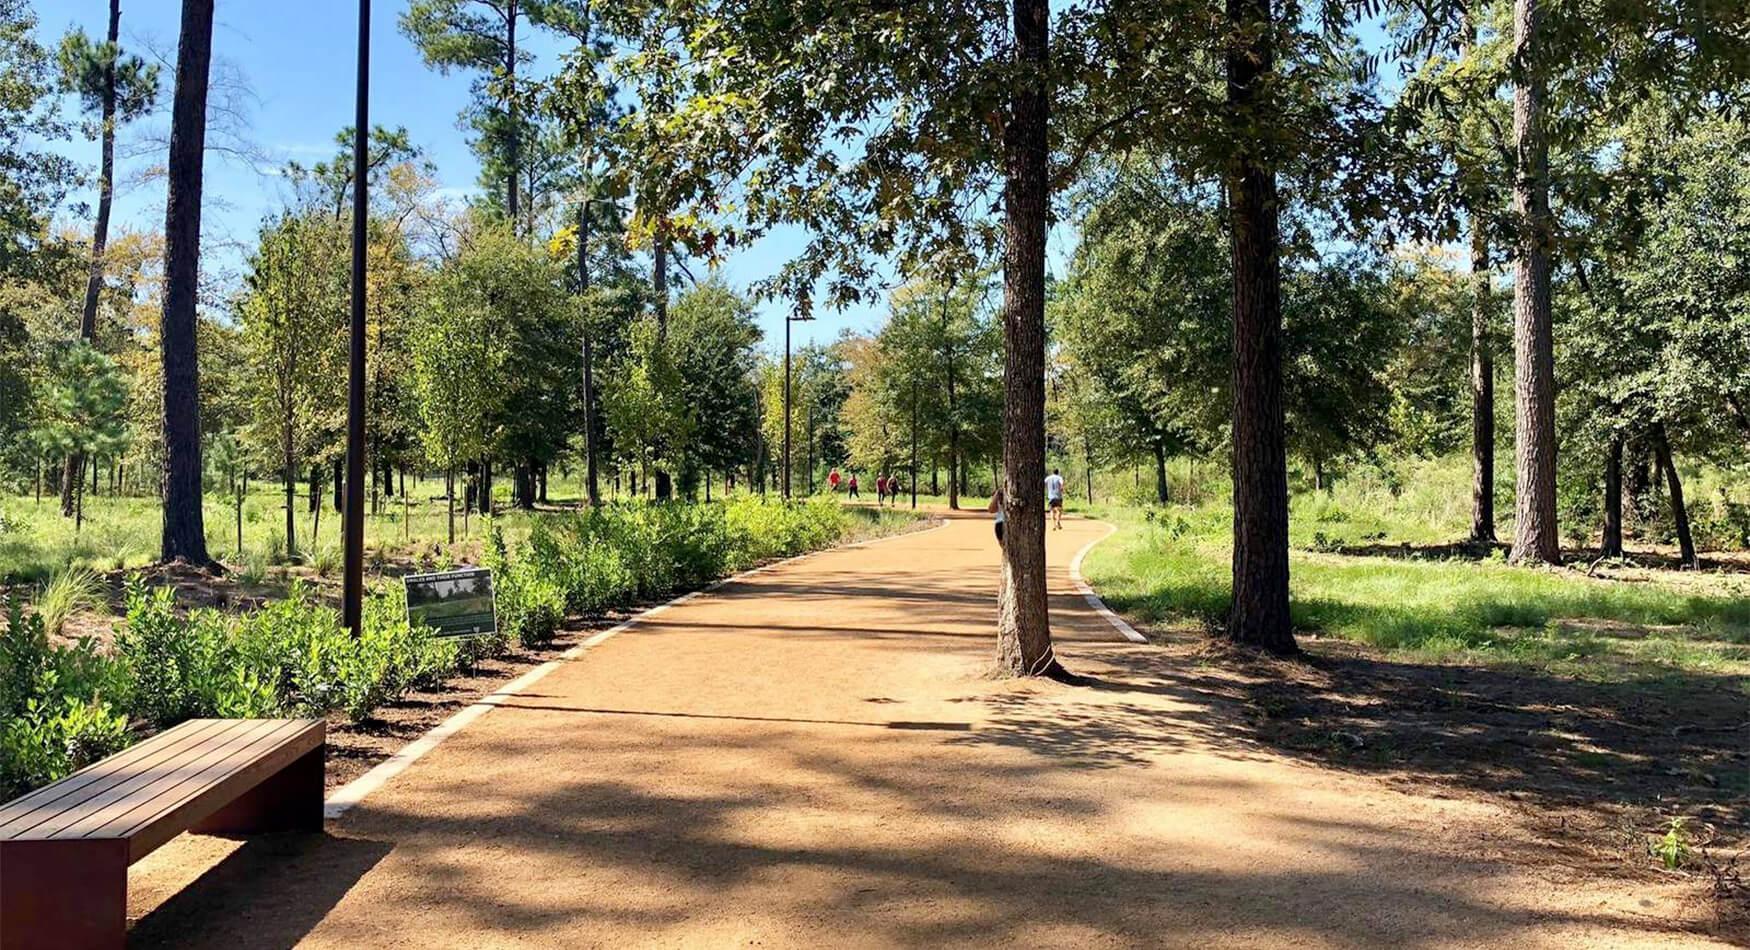 Brians Favorite Parks to Visit